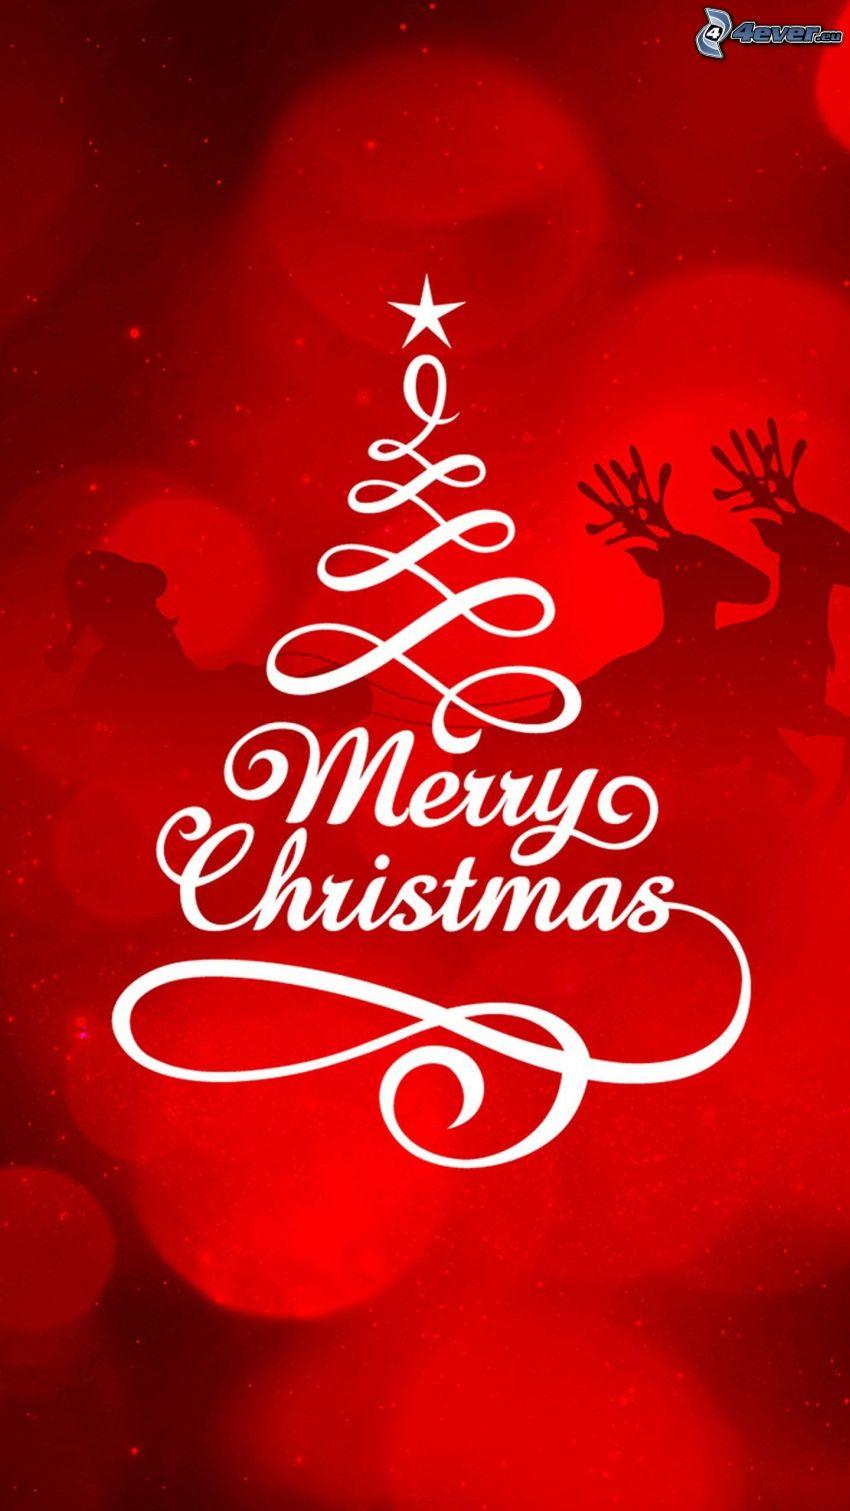 Merry Christmas, renar, släde, Santa Claus, siluetter, julgran, röd bakgrund